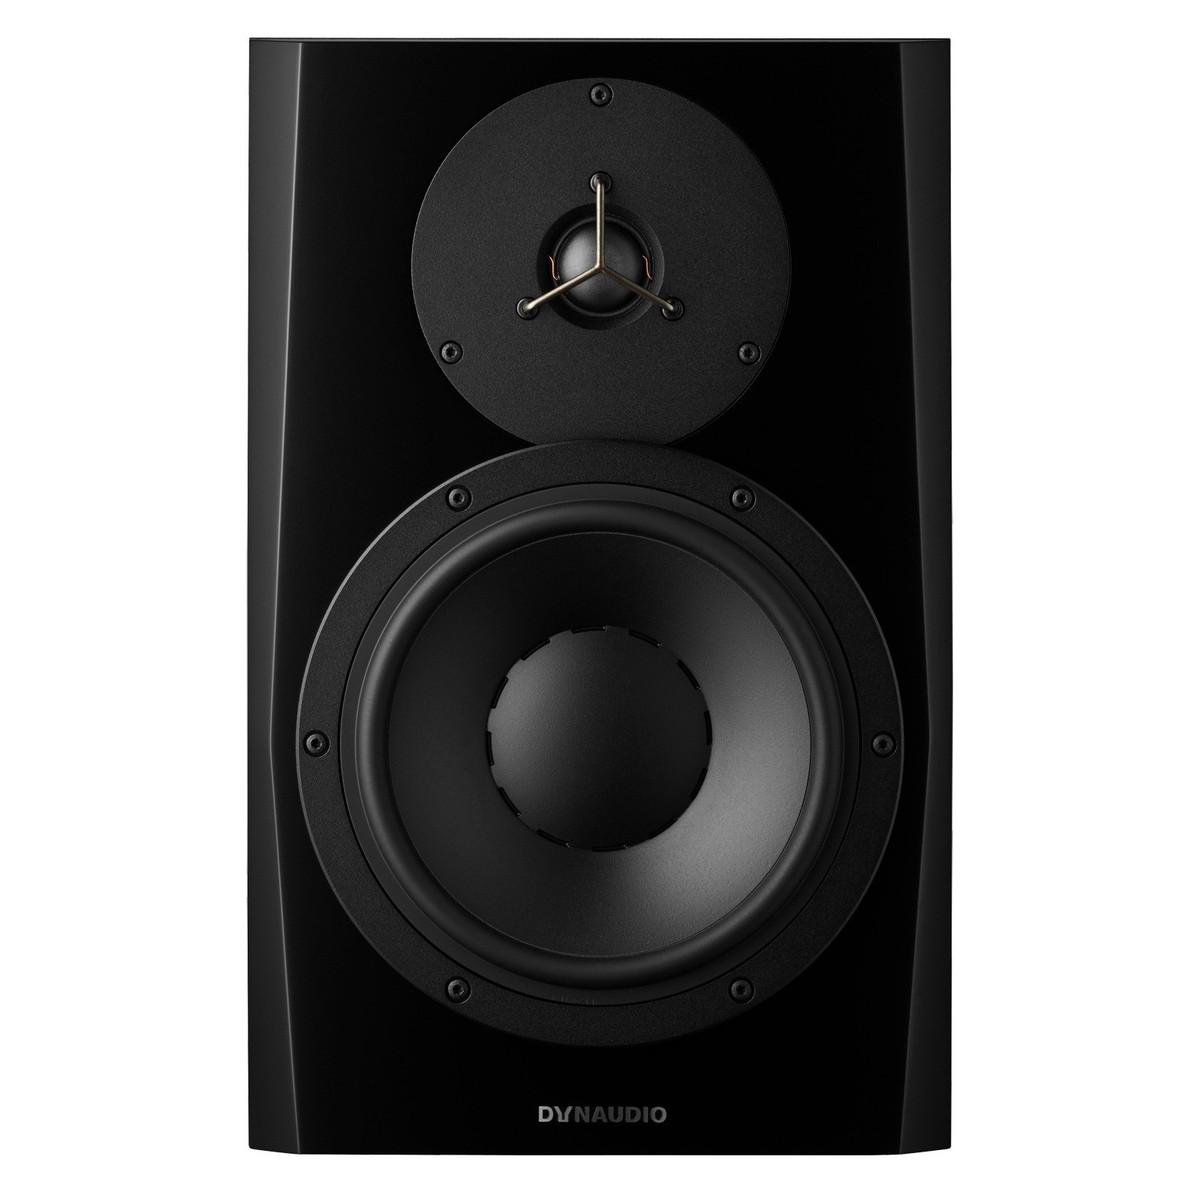 dynaudio lyd 8 near field studio monitor black at gear4music. Black Bedroom Furniture Sets. Home Design Ideas